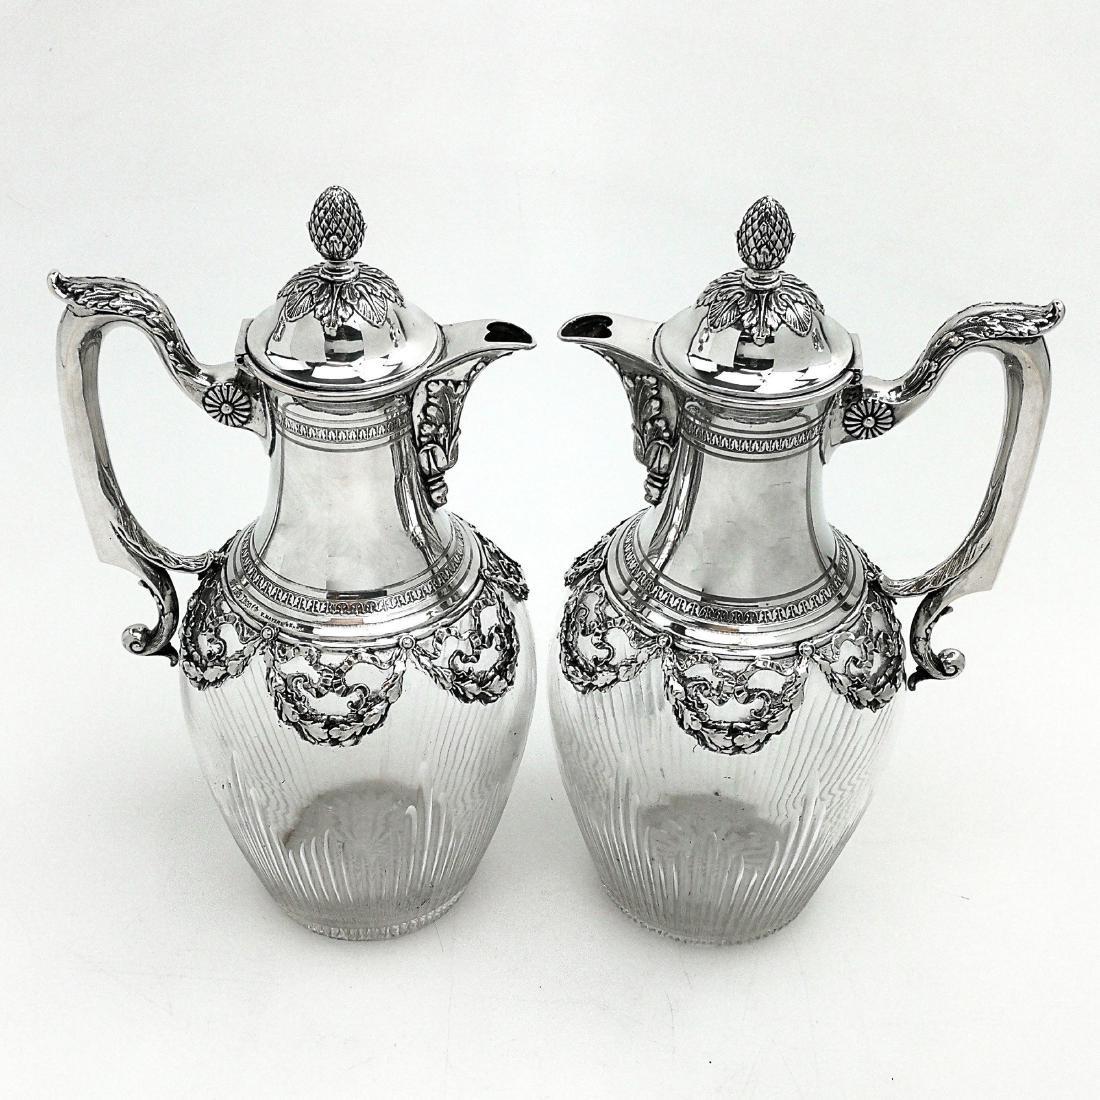 PAIR ANTIQUE GERMAN SOLID SILVER & GLASS CLARET JUGS /